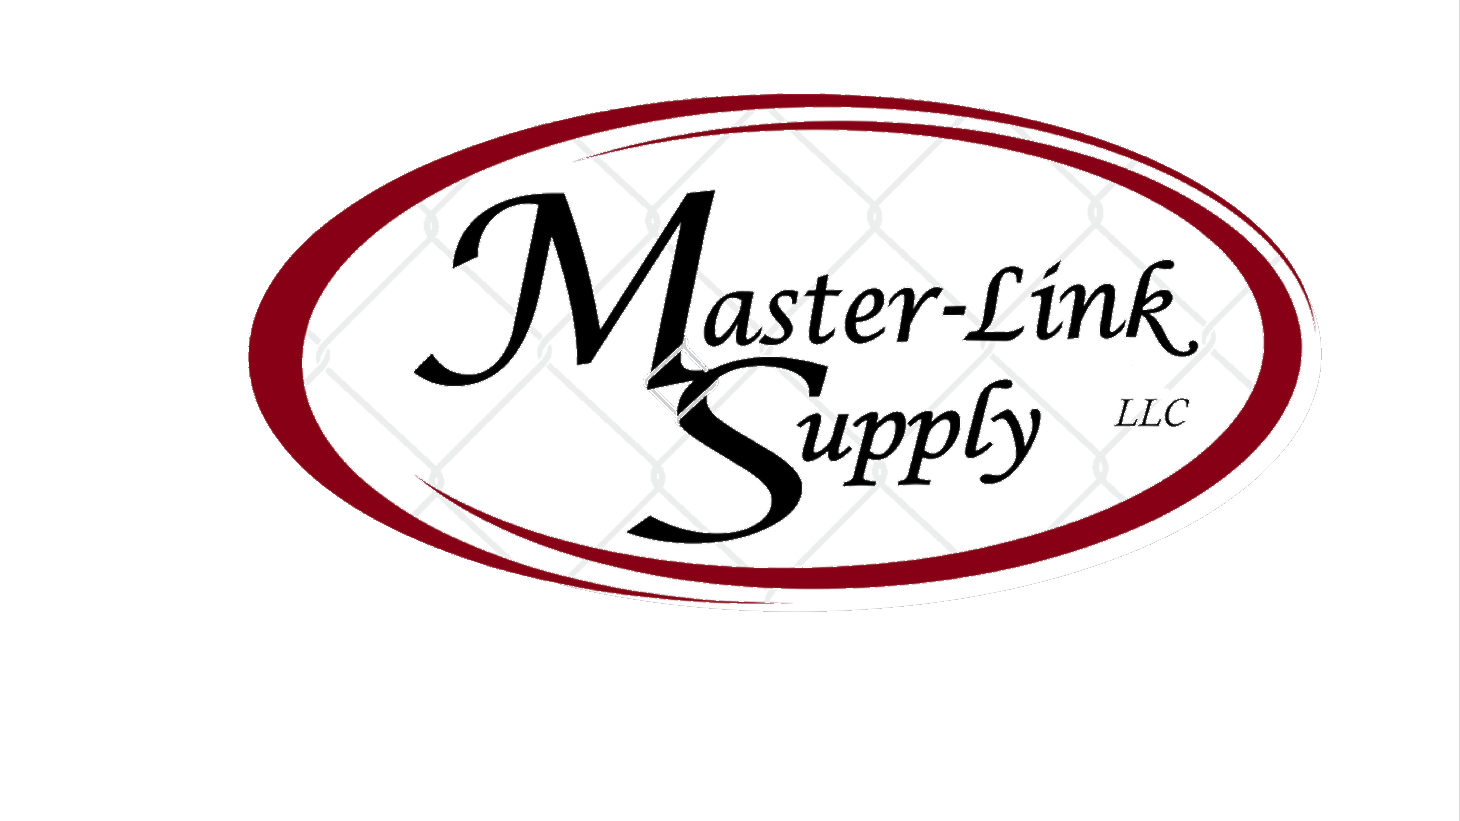 Master-Link Supply